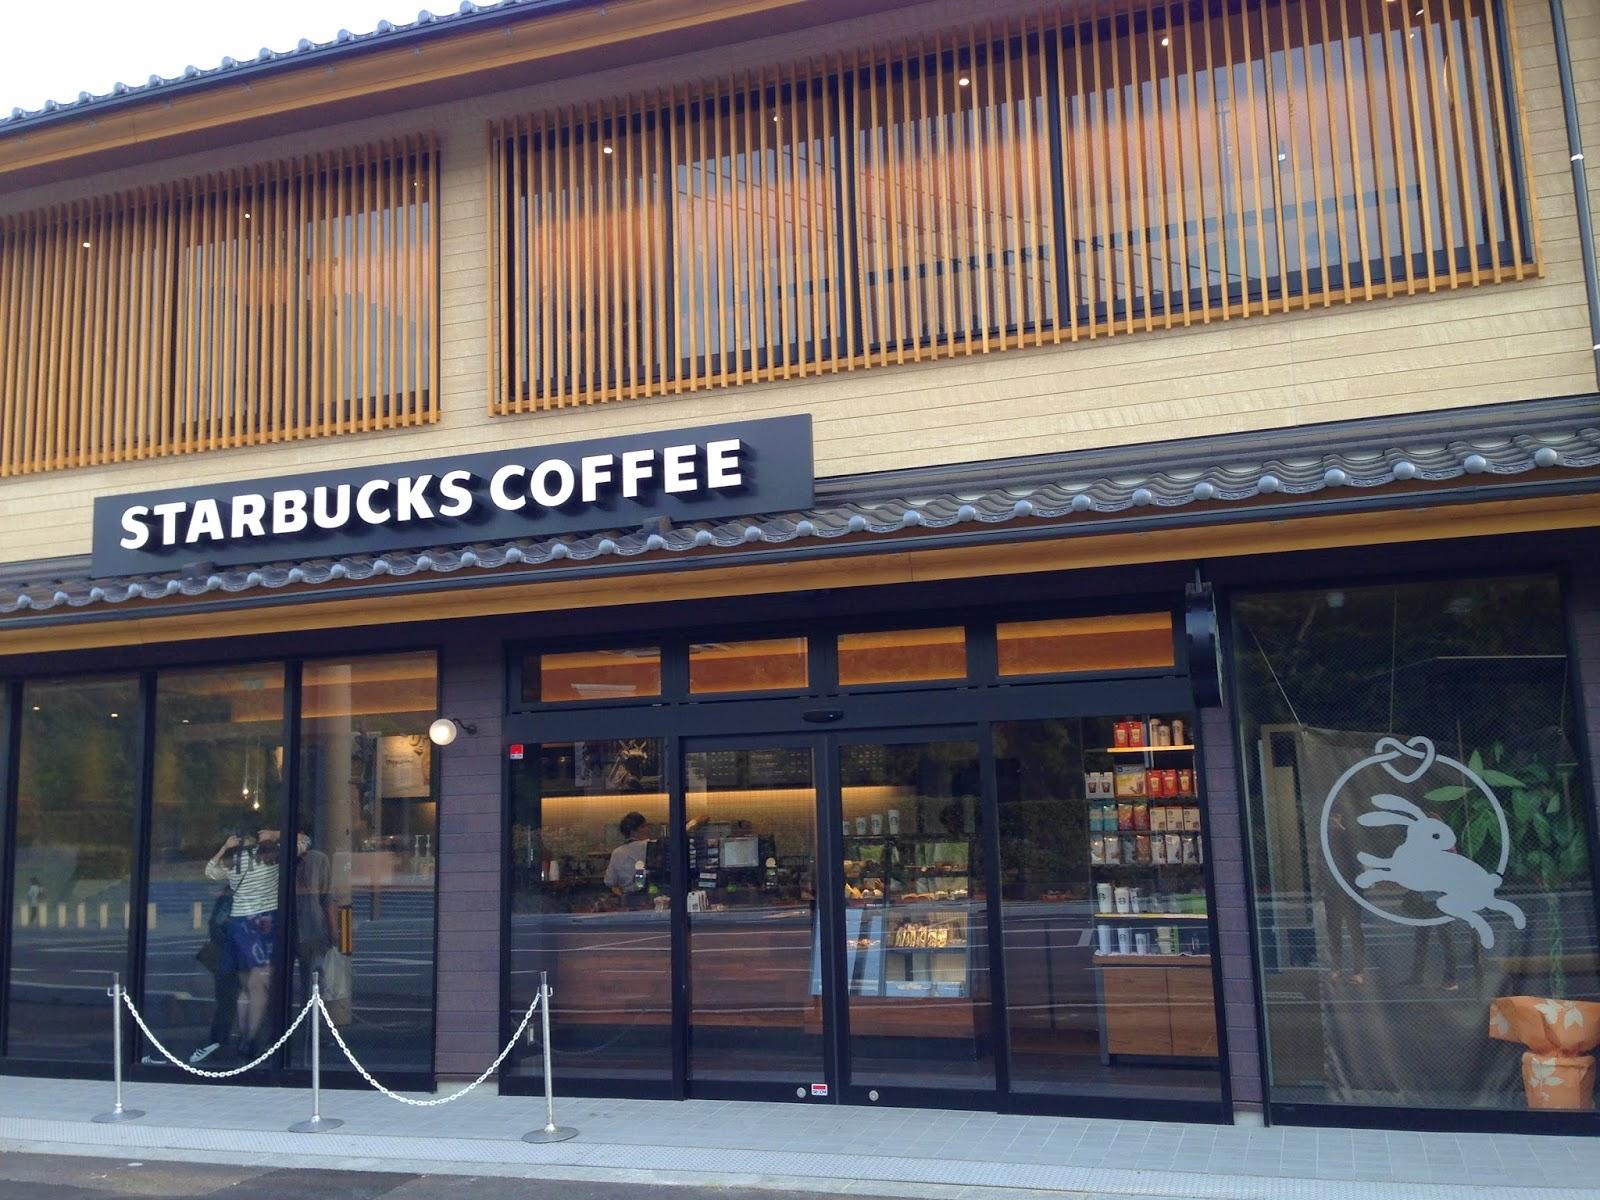 Tiệm Starbucks Izumo Taisha, Shimane